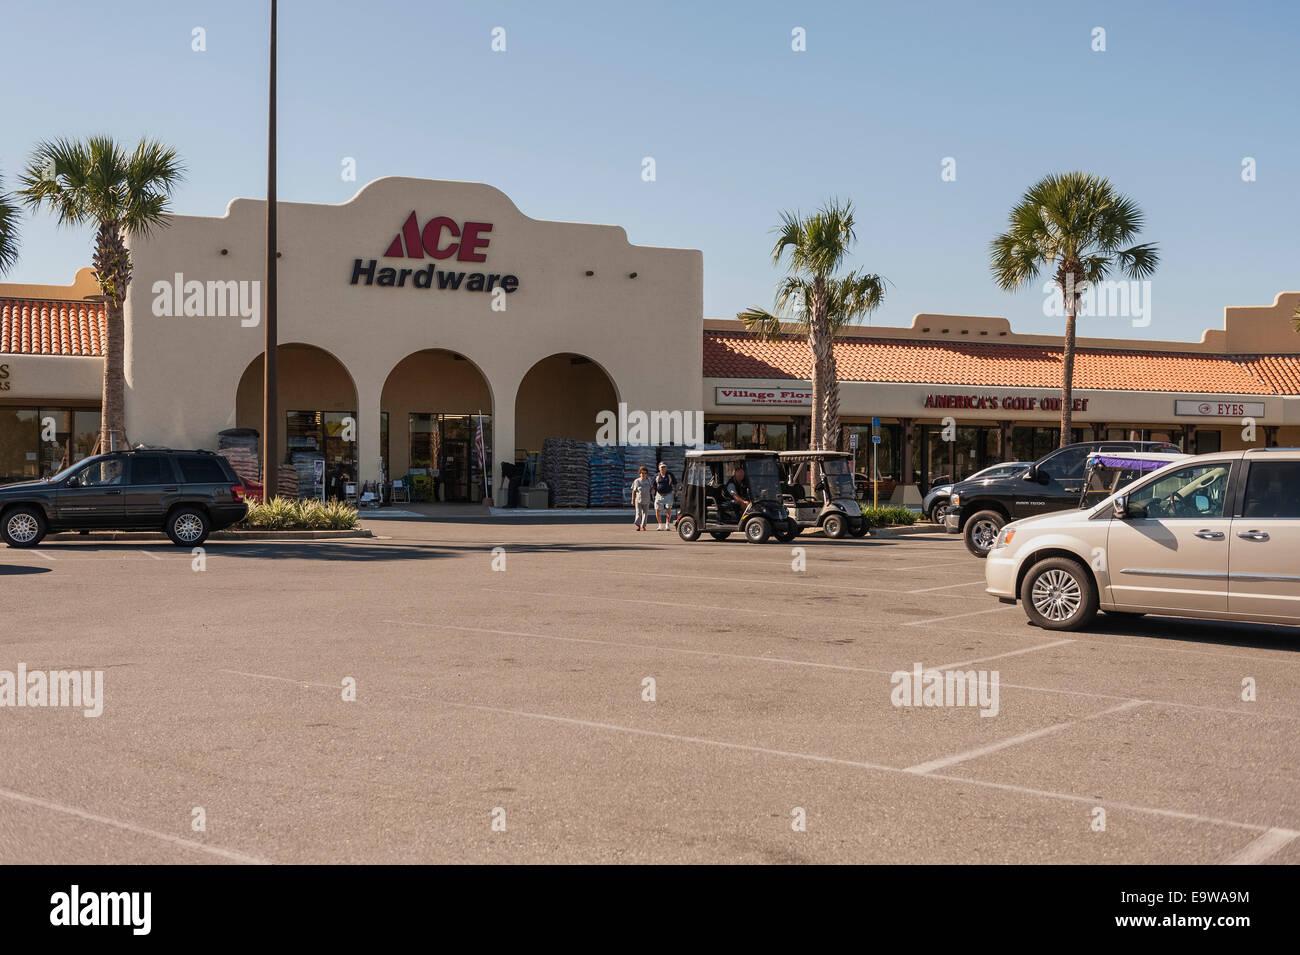 Ace Hardware Stock Photos & Ace Hardware Stock Images - Alamy